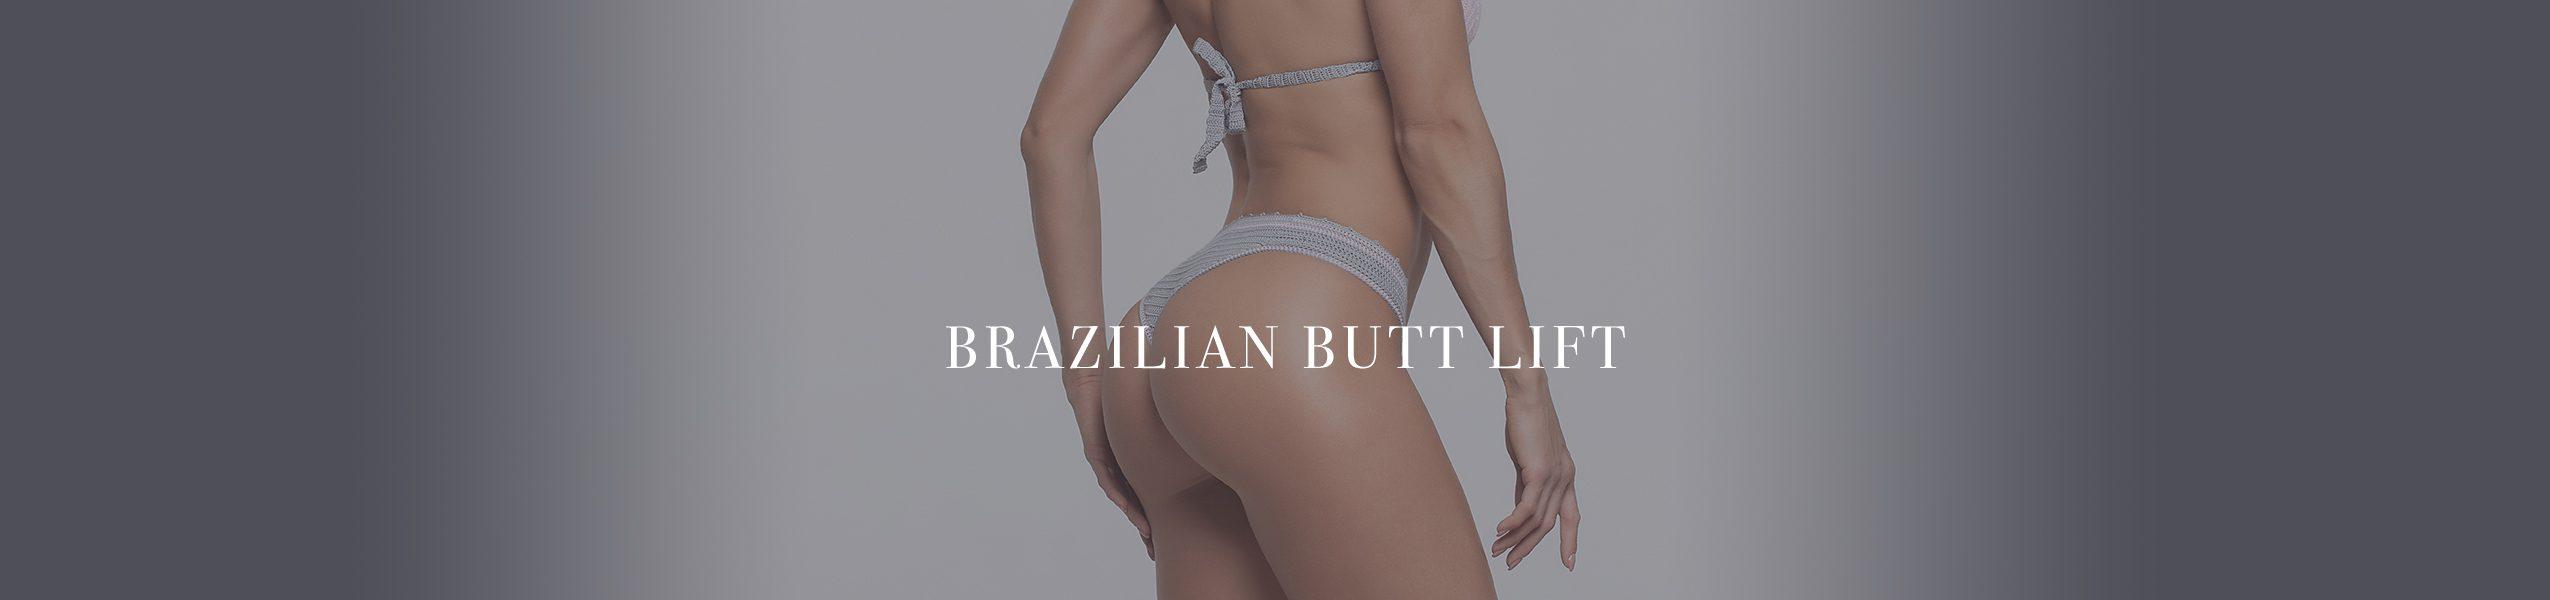 Brazilian Butt Lift Boca Raton | Boca Raton Brazilian Butt Lift Surgeon